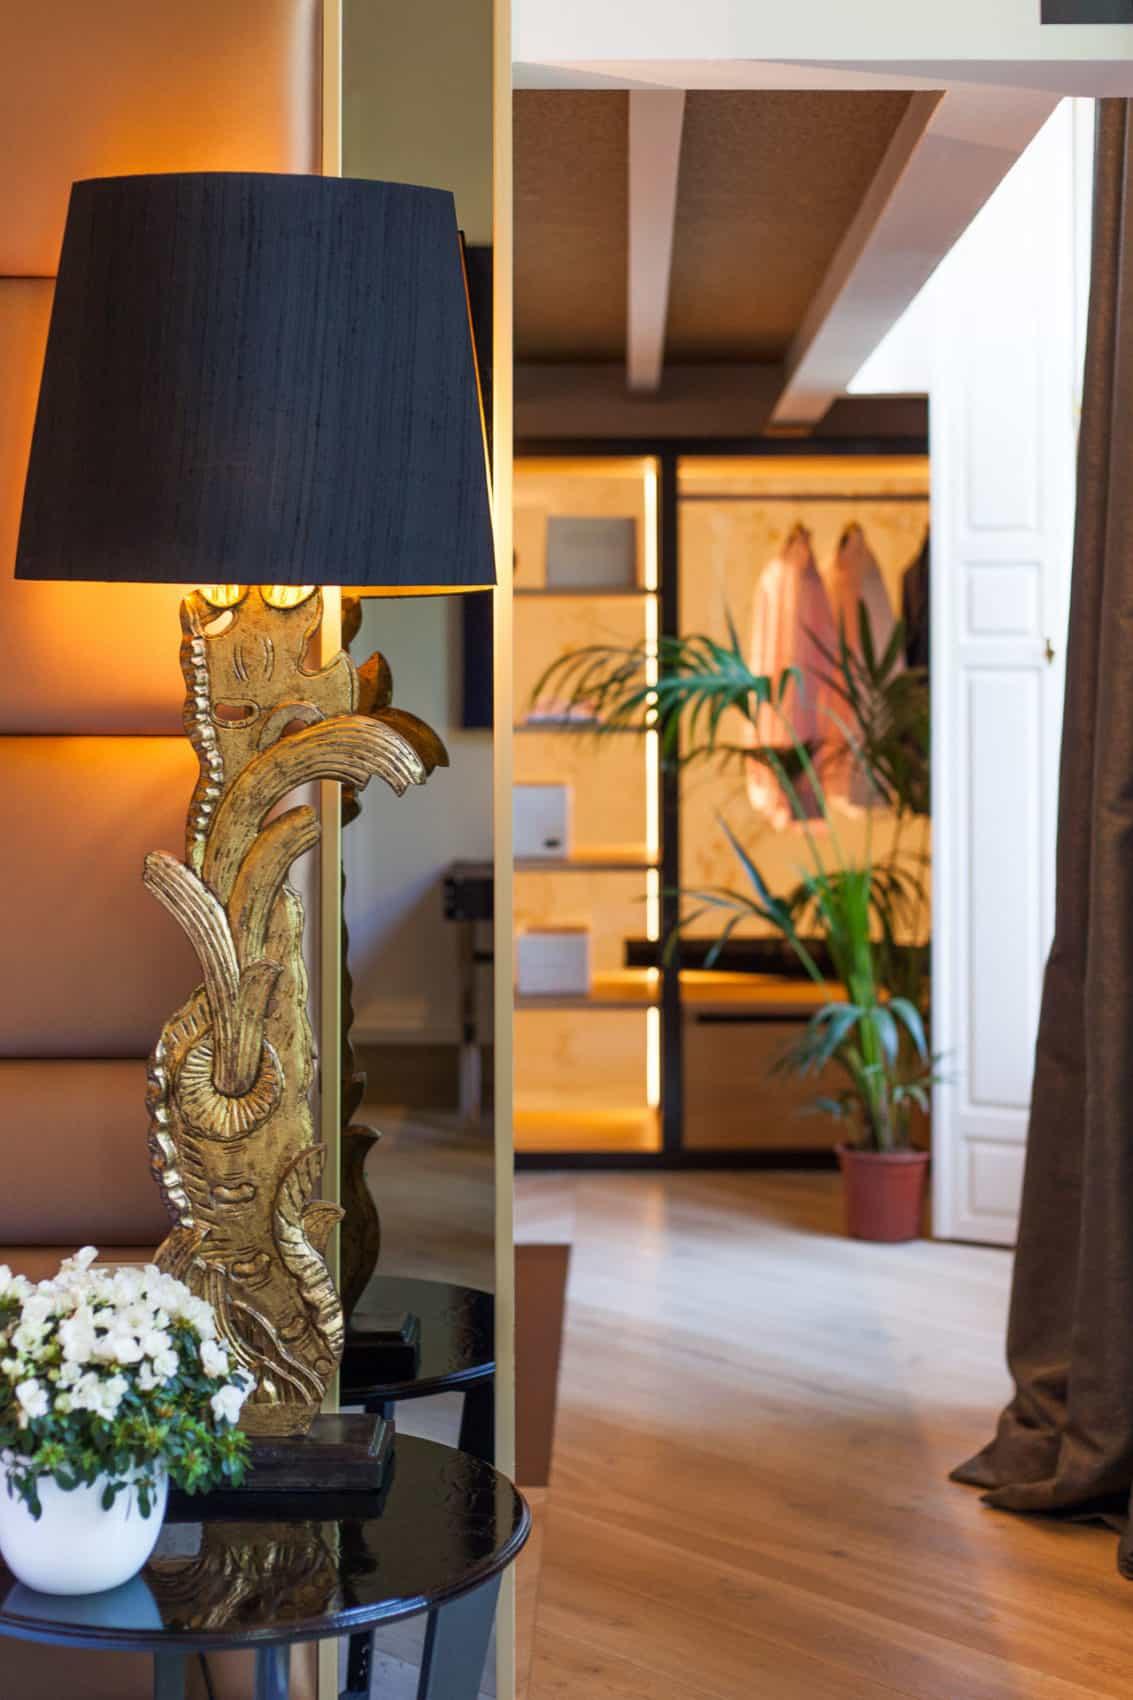 Suite Splendeur by Disak-Diseño de interiores (4)